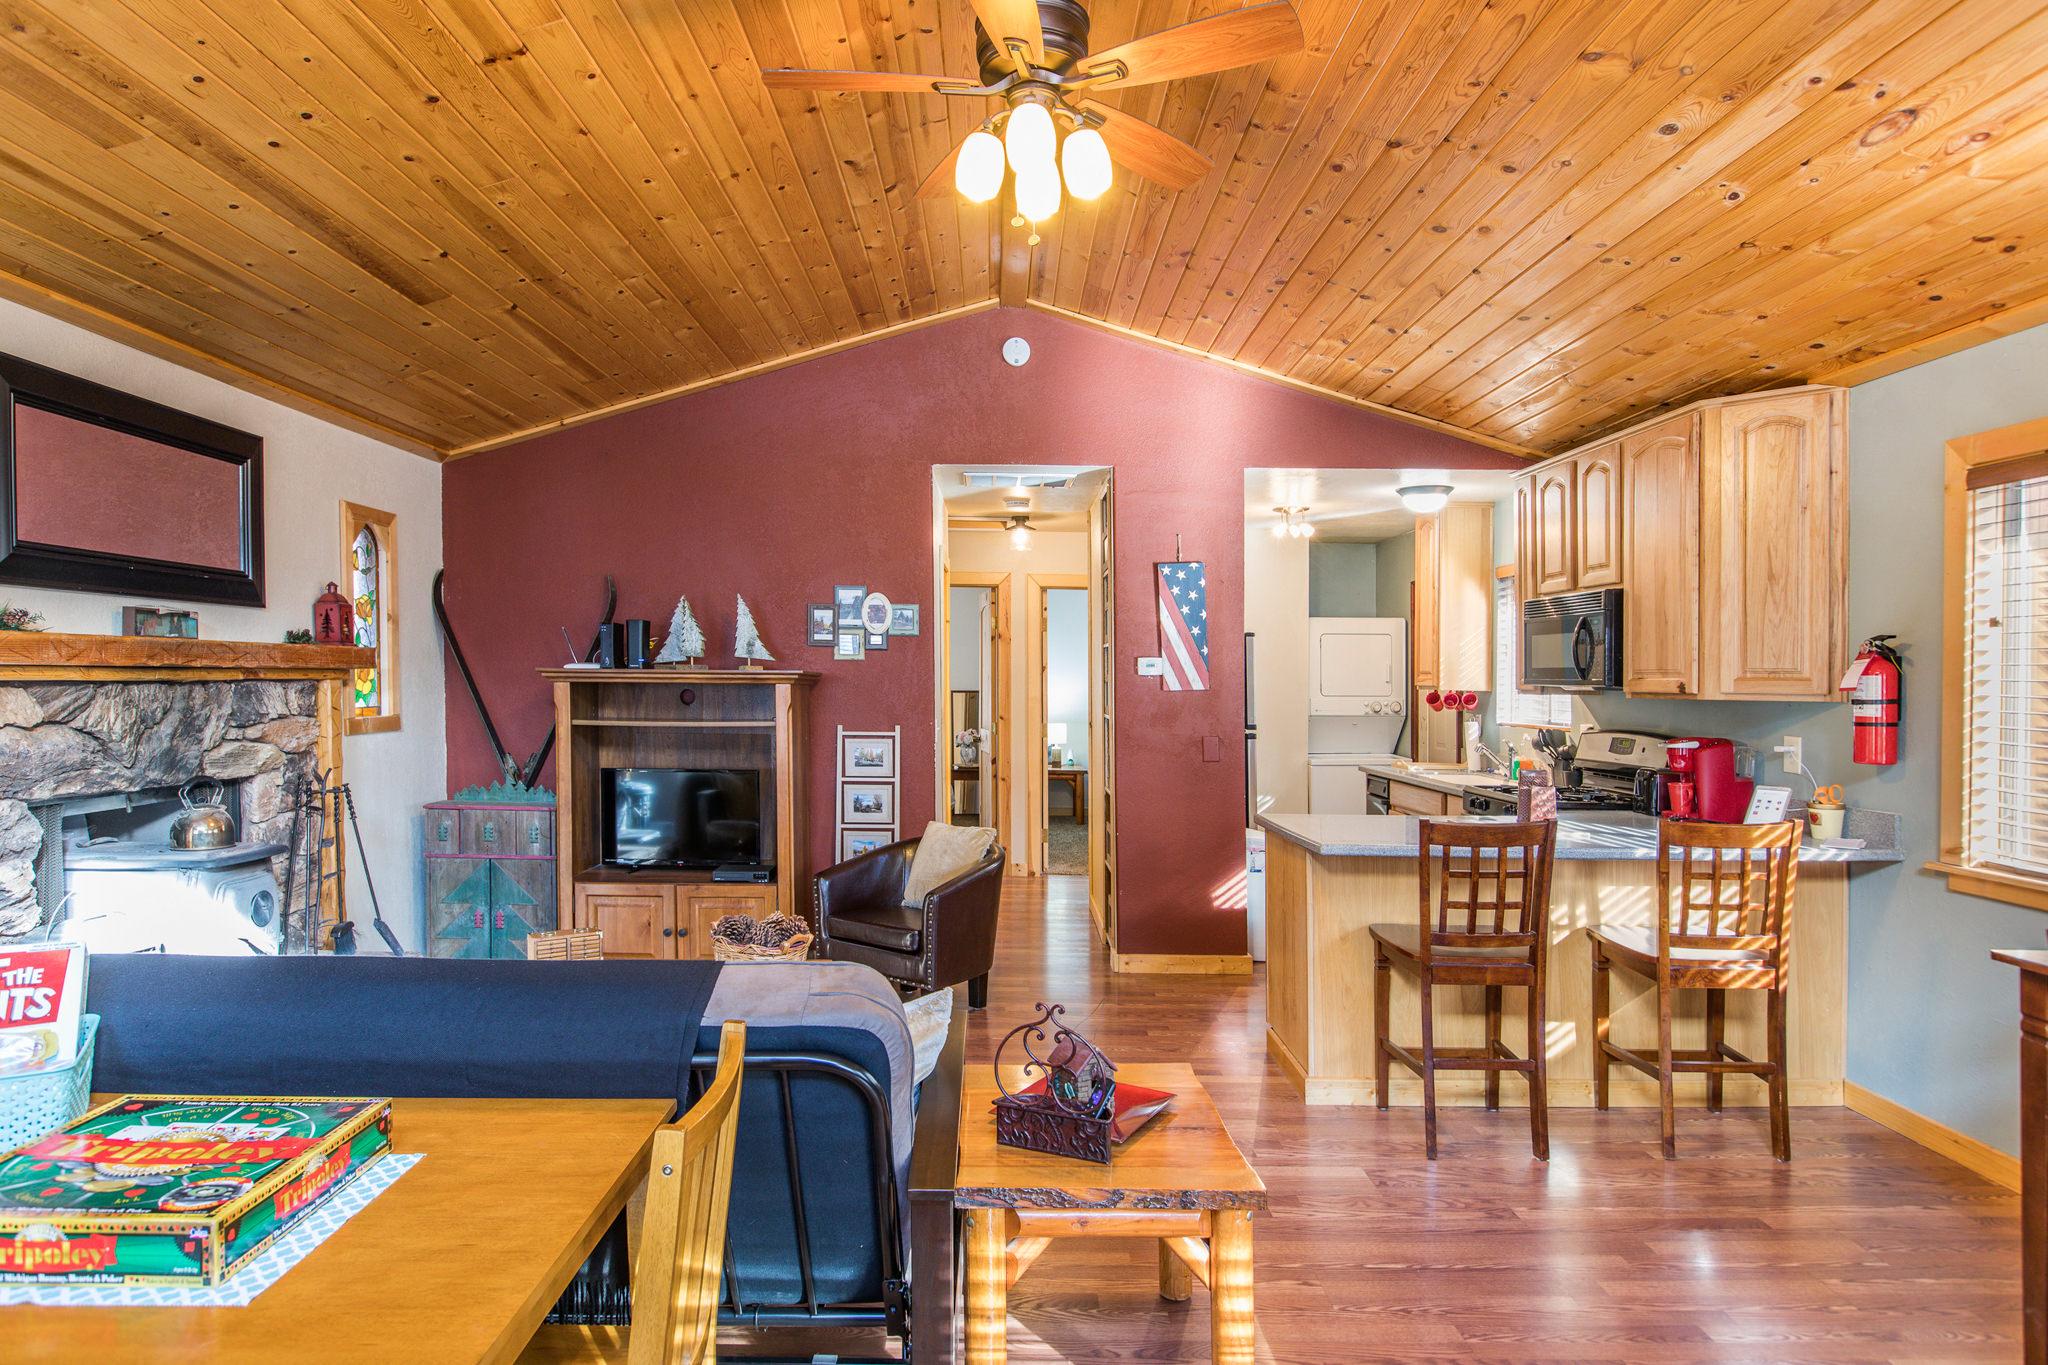 Big Bear CA Vacation Rental Your comfy home